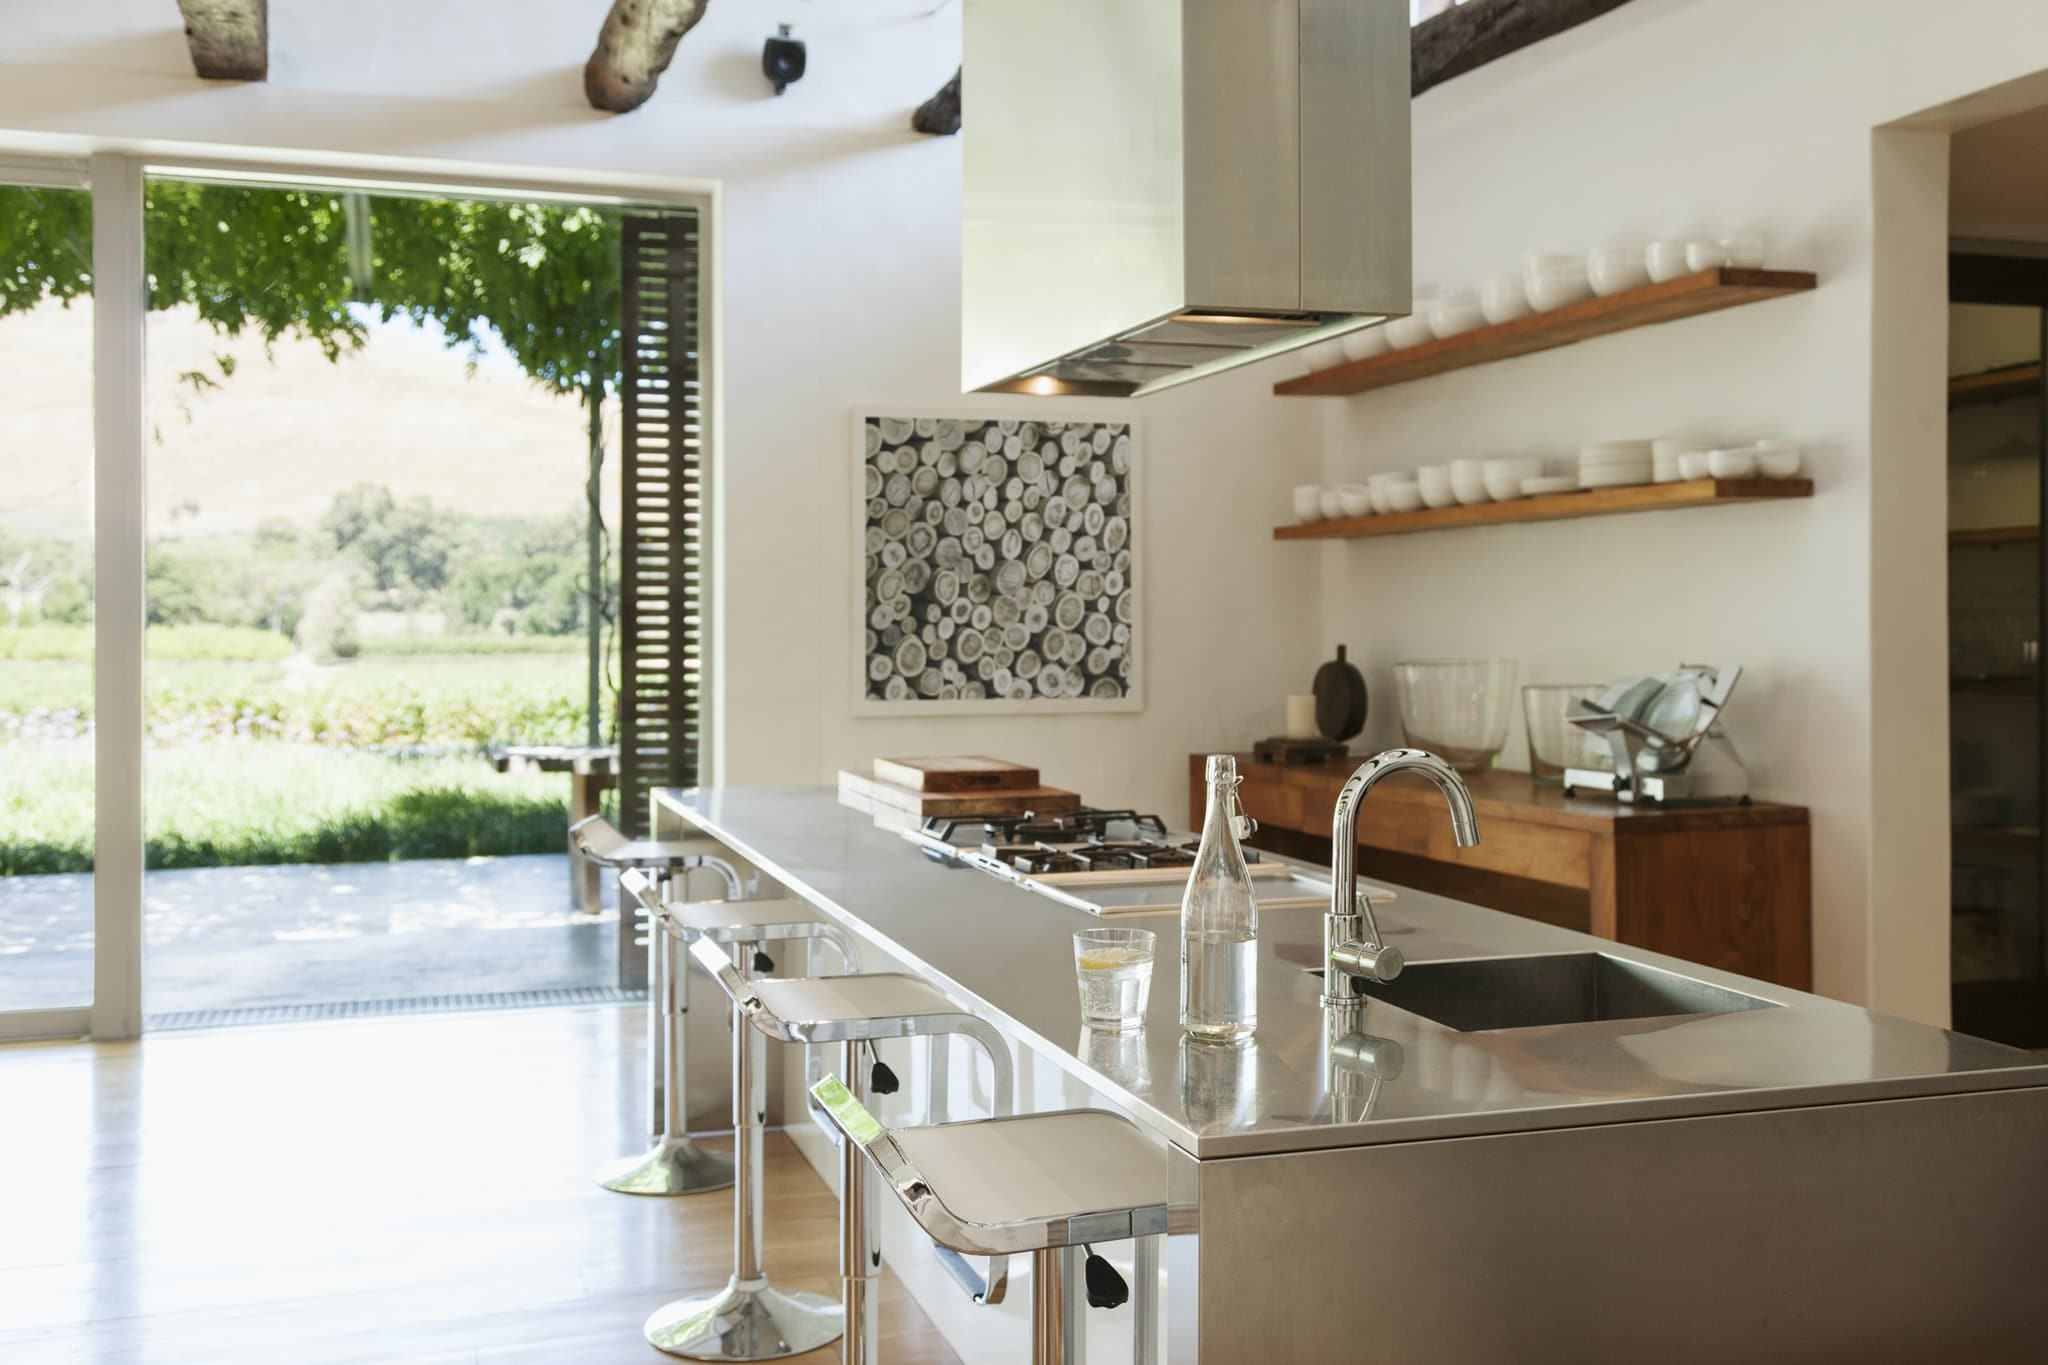 Modern kitchen overlooking patio and vineyard